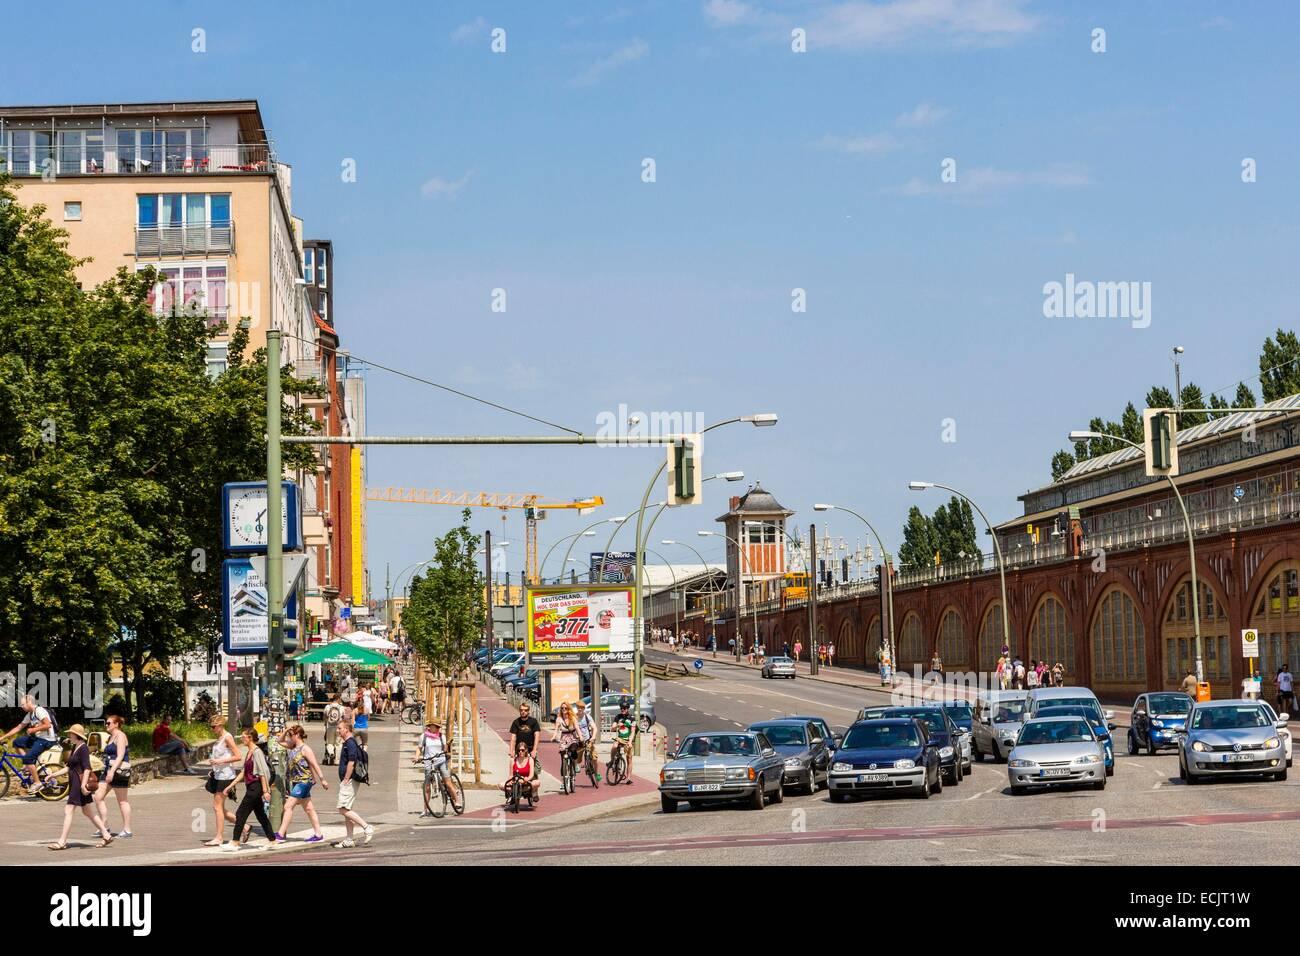 Alemania, Berlín, Berlín Oriental, Friedrichshain, East Side Gallery, Warschauer Strasse Imagen De Stock